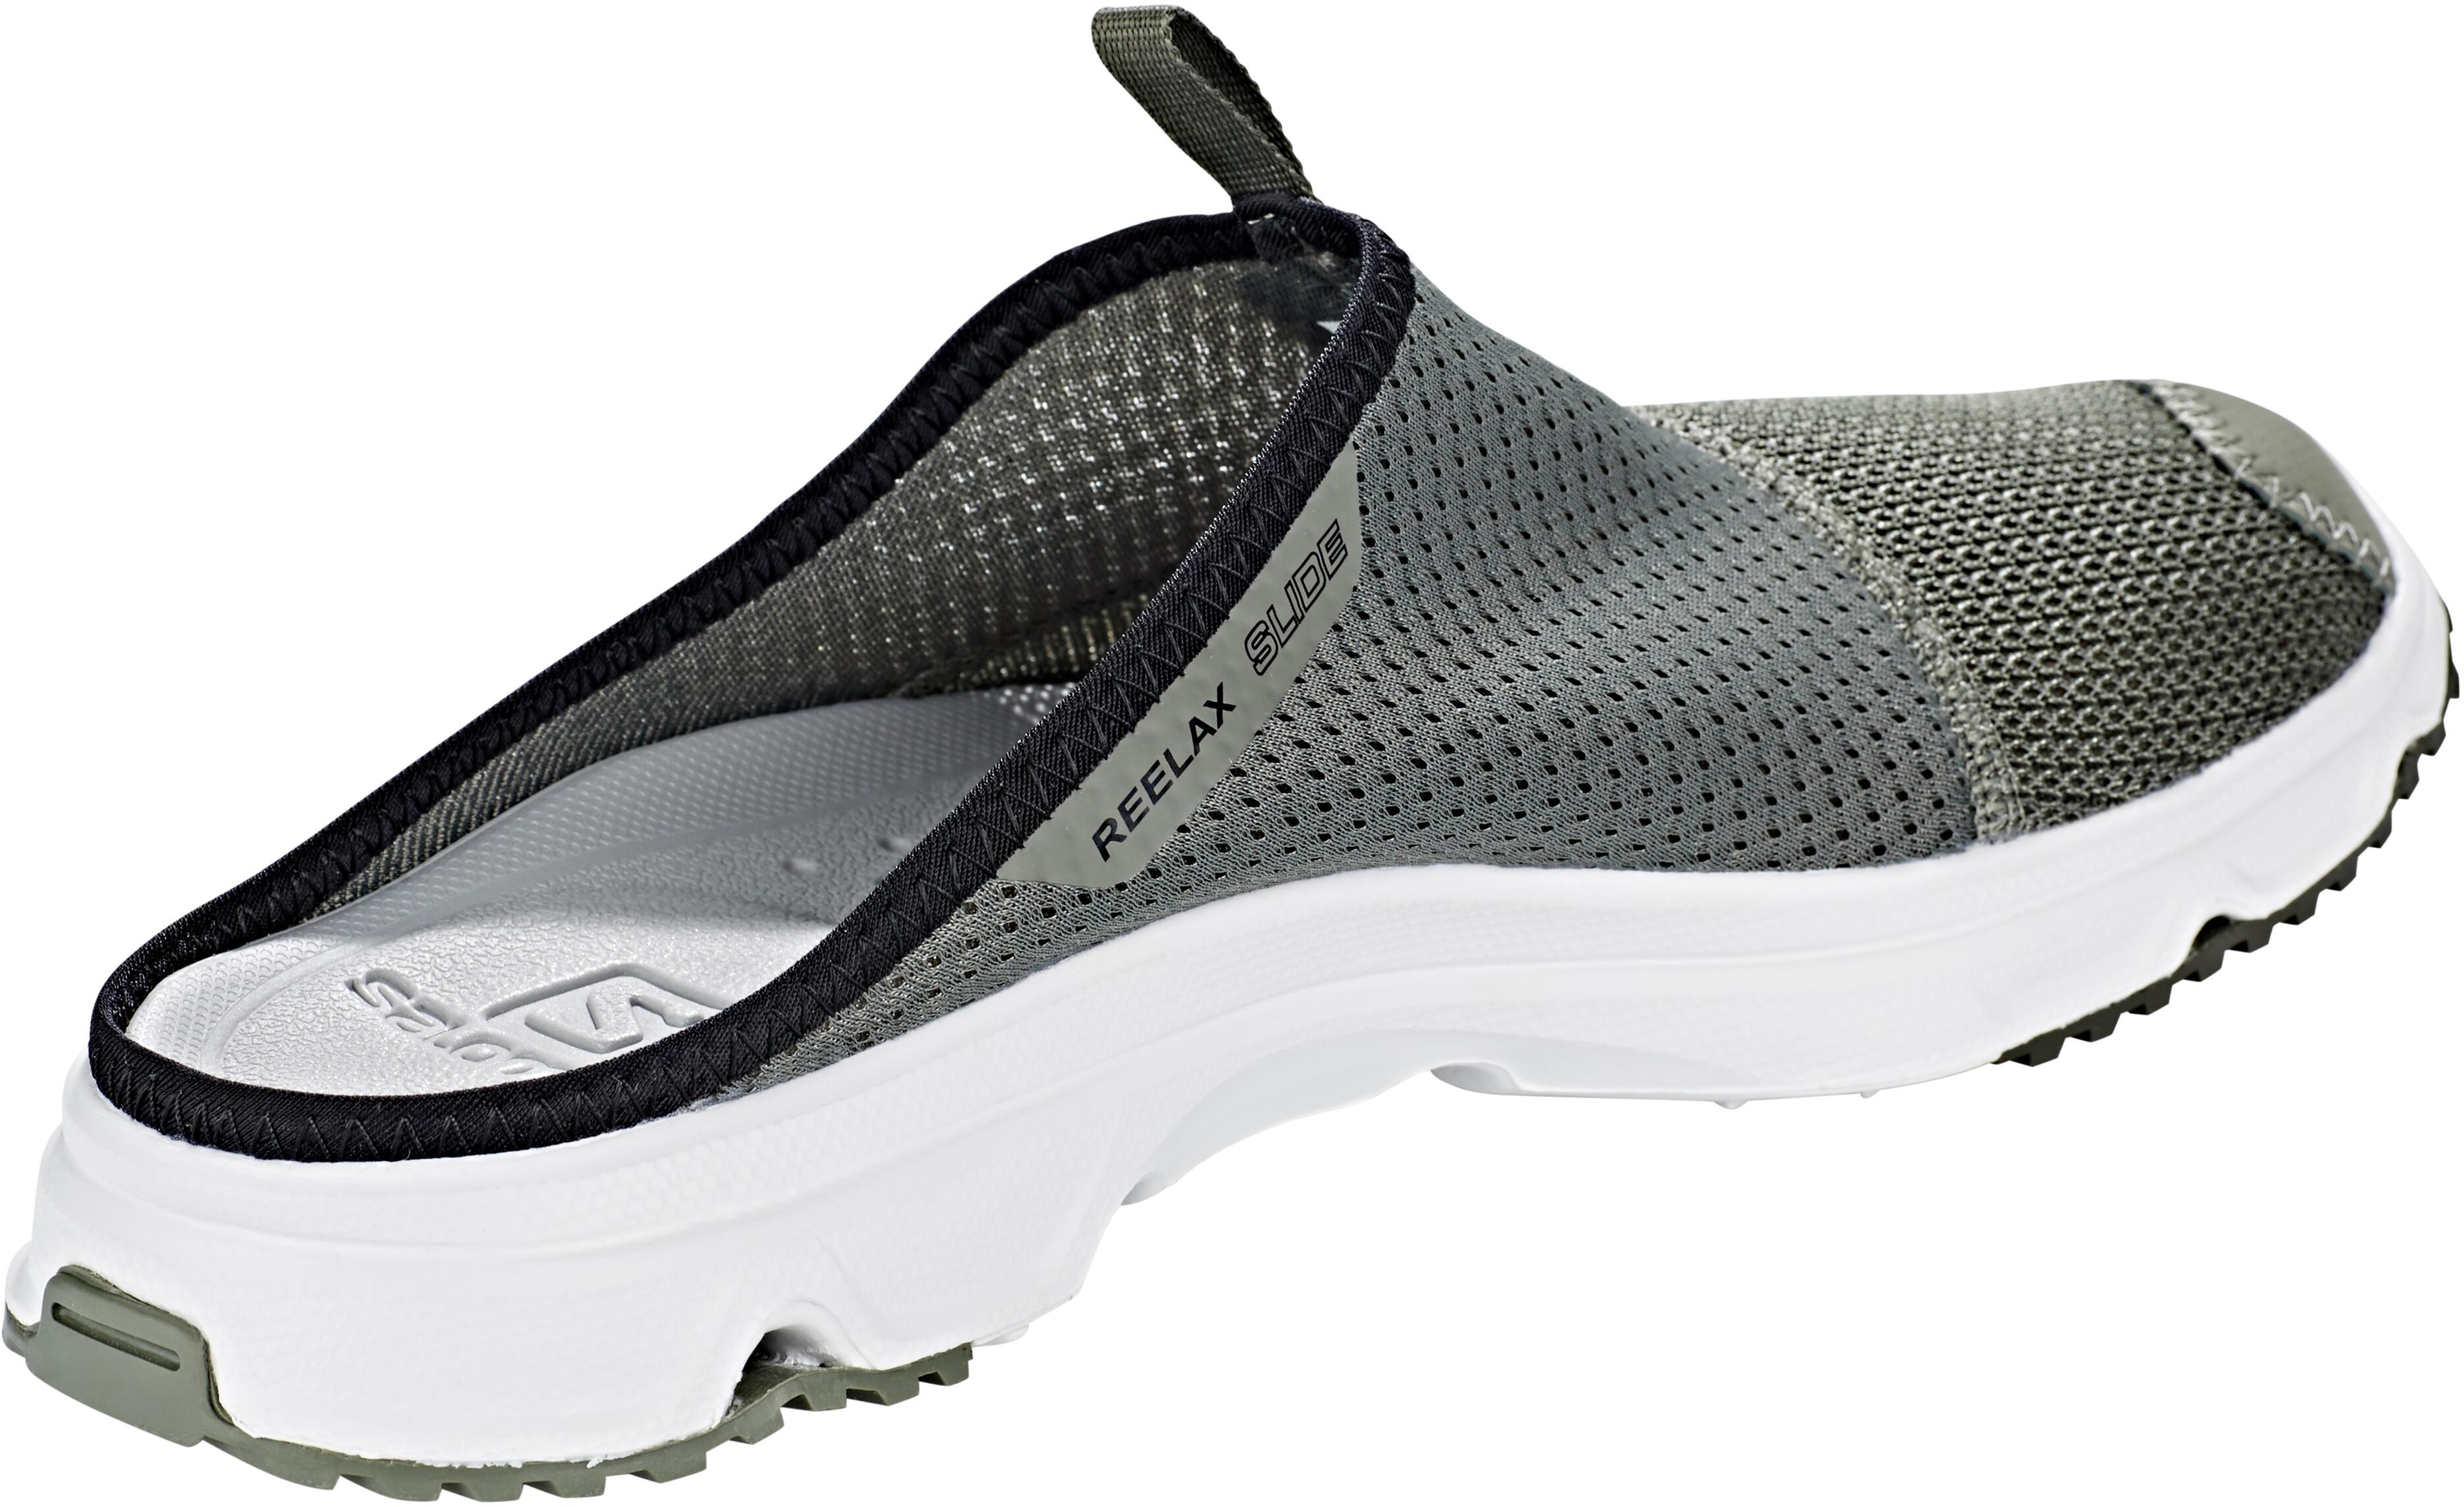 f96f15a9d6f Salomon RX Slide 4.0 - Chaussures running Homme - gris sur CAMPZ !